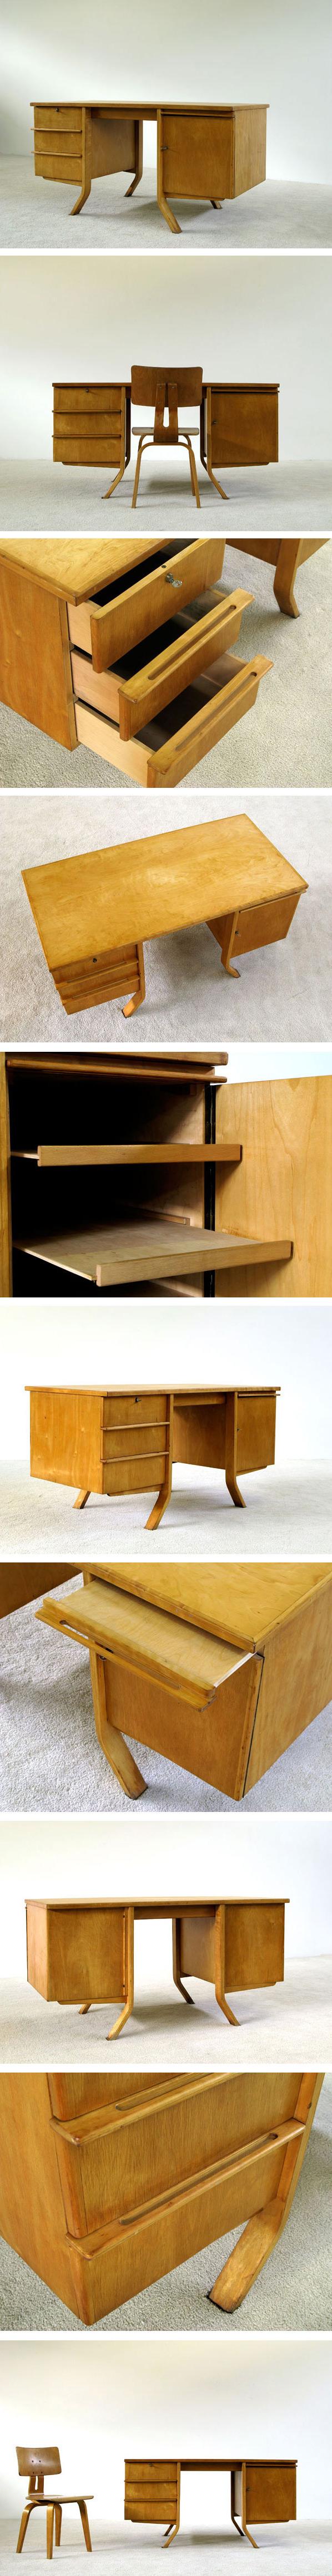 Cees Braakman Birch wood writing desk UMS Pastoe Large